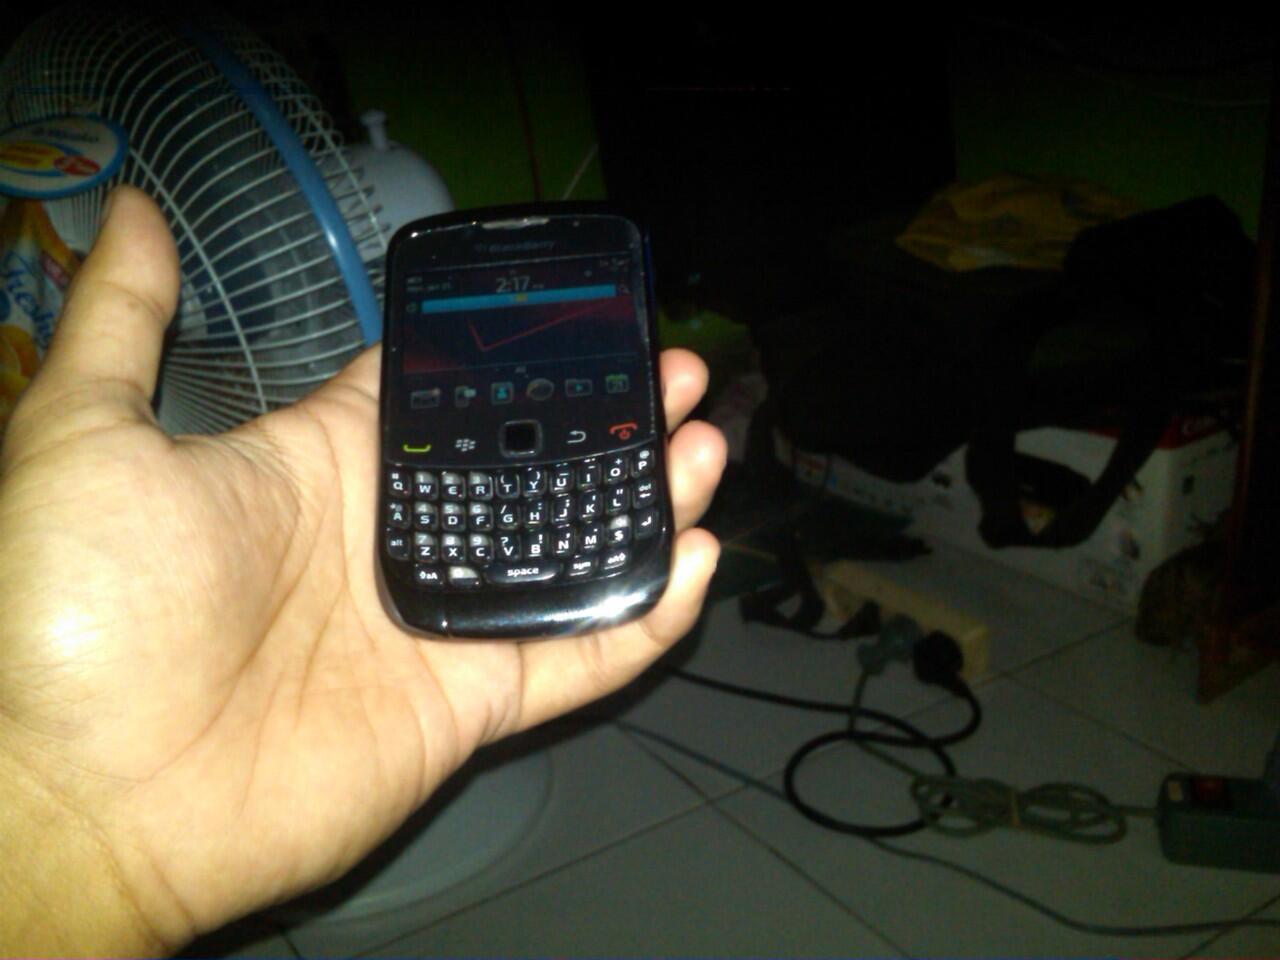 blackberry 9330 keppler dan 9630 tour garansi 1 bulan vu du 00